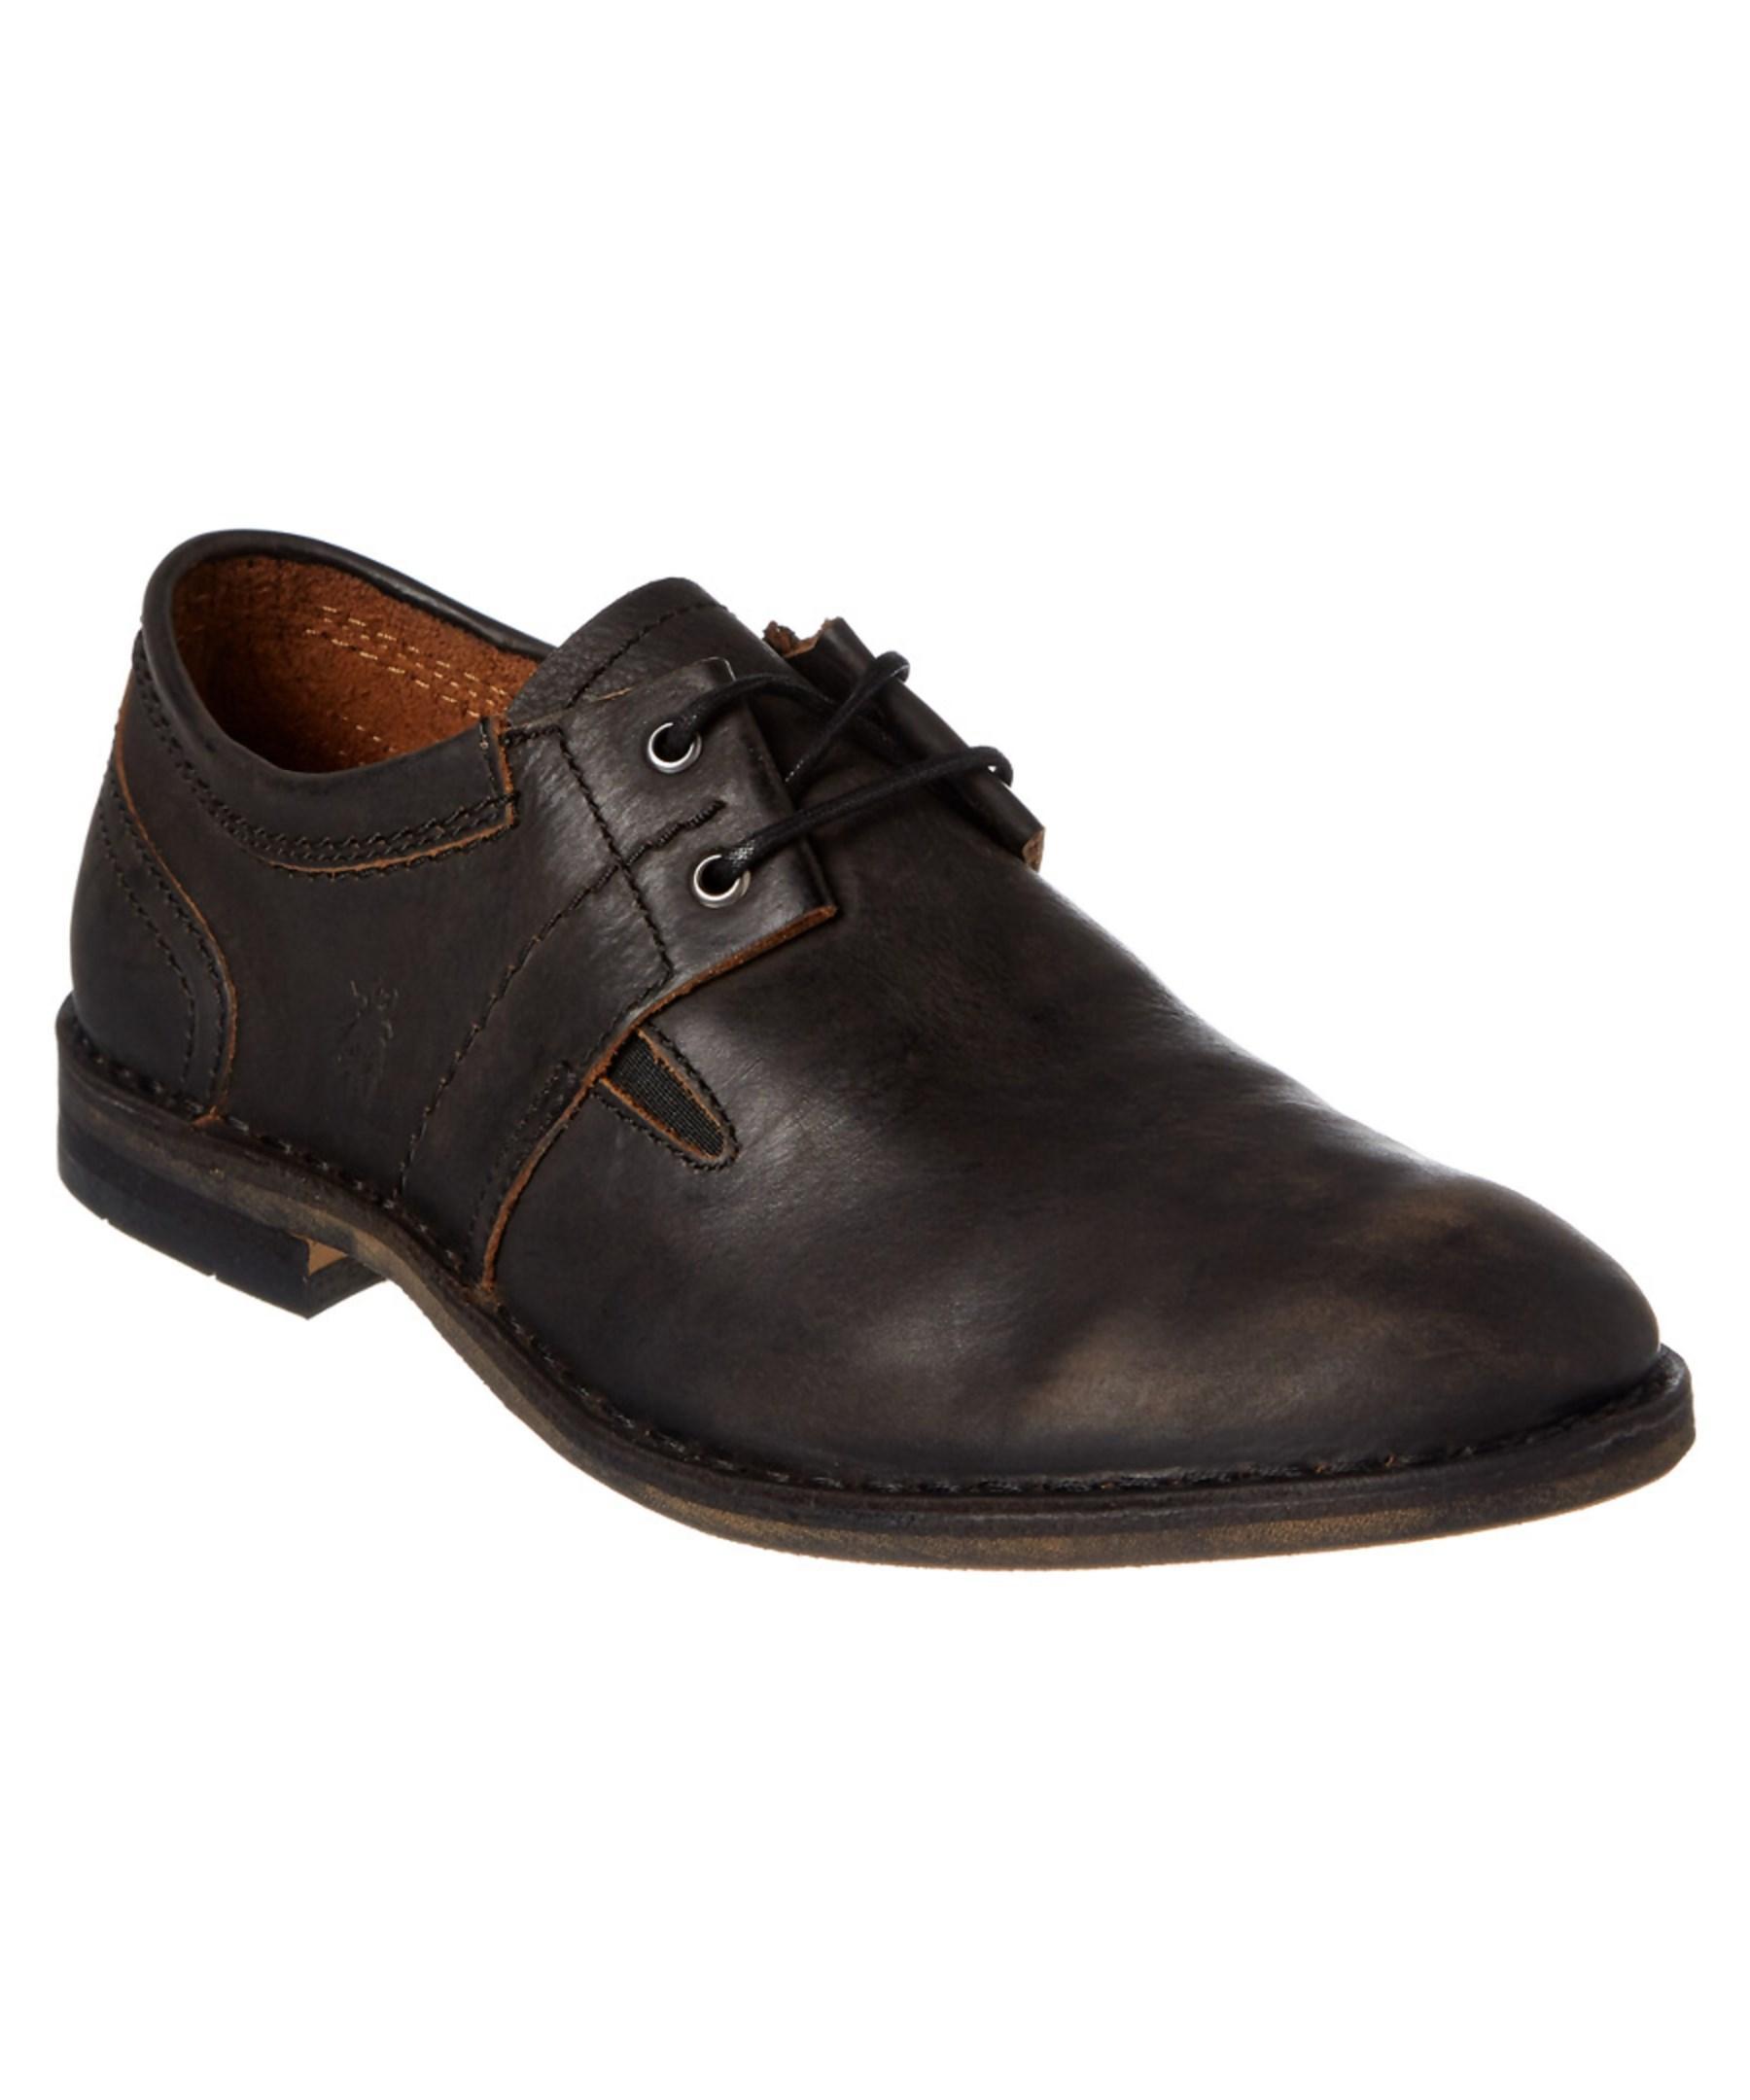 Fly London Mens Murt Leather Oxford In Black For Men